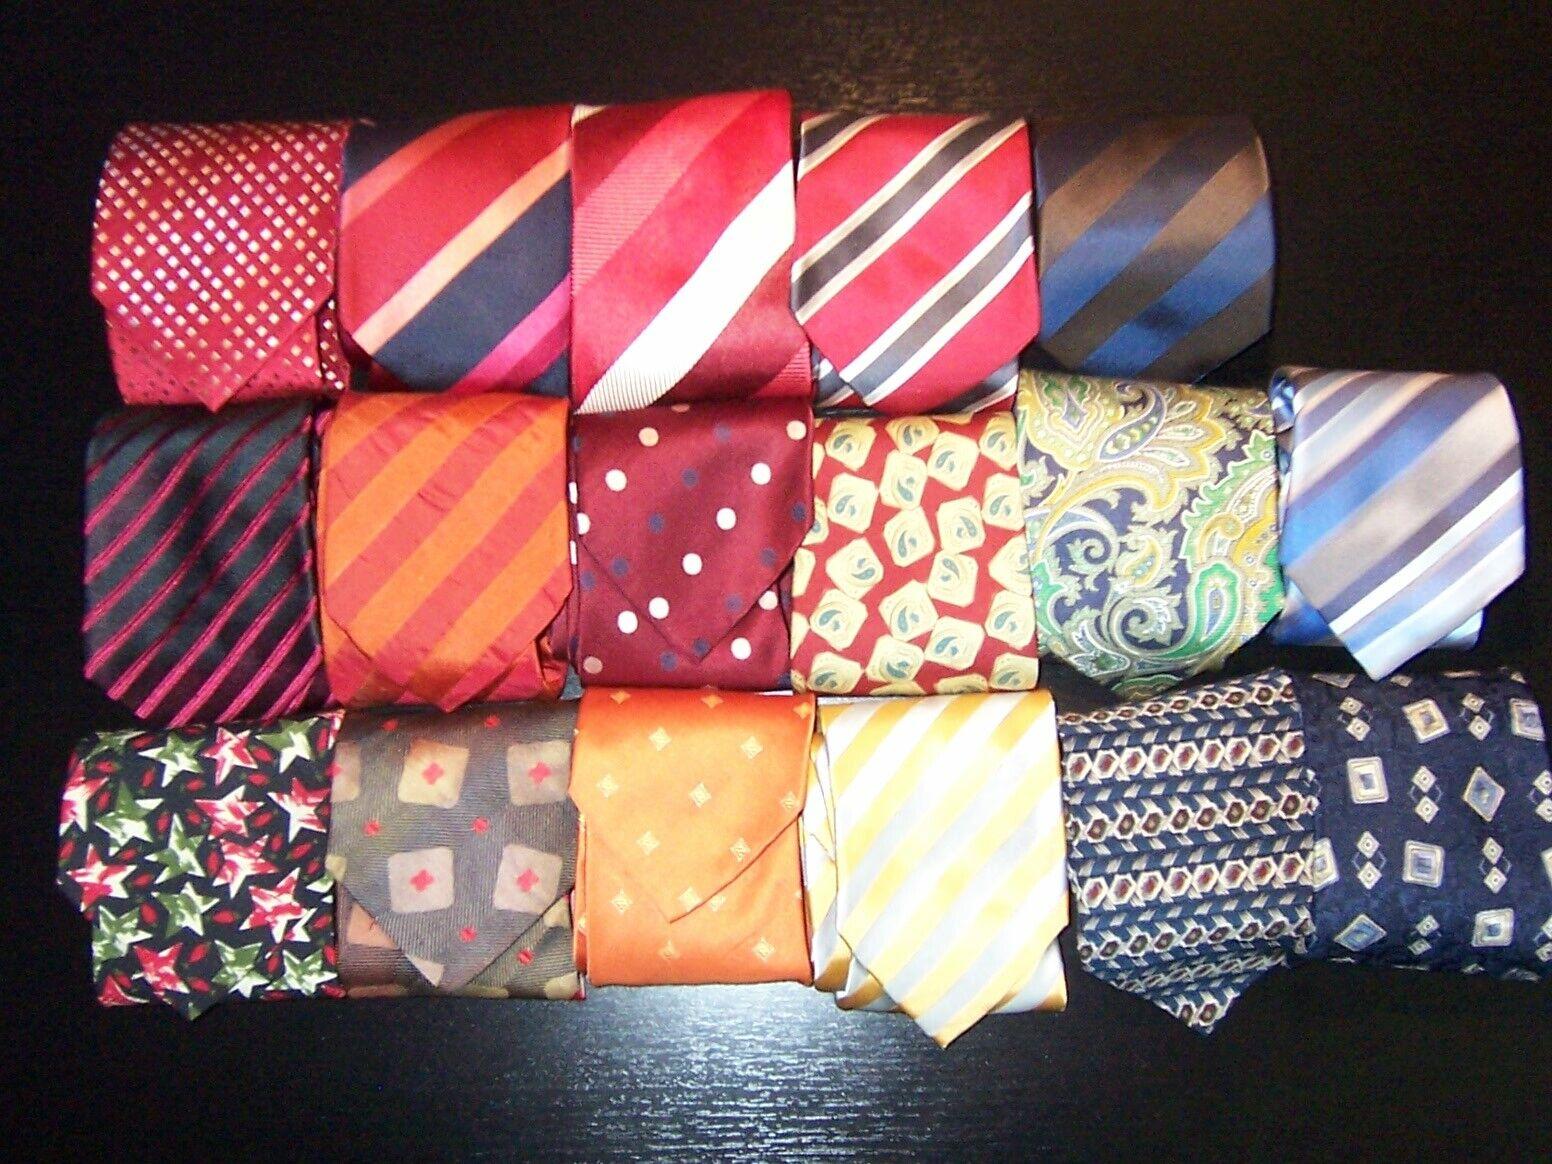 17 Tie Silk of Altea, EDSOR KRONEN, ATWARDSON, Boss, Biella, Superba